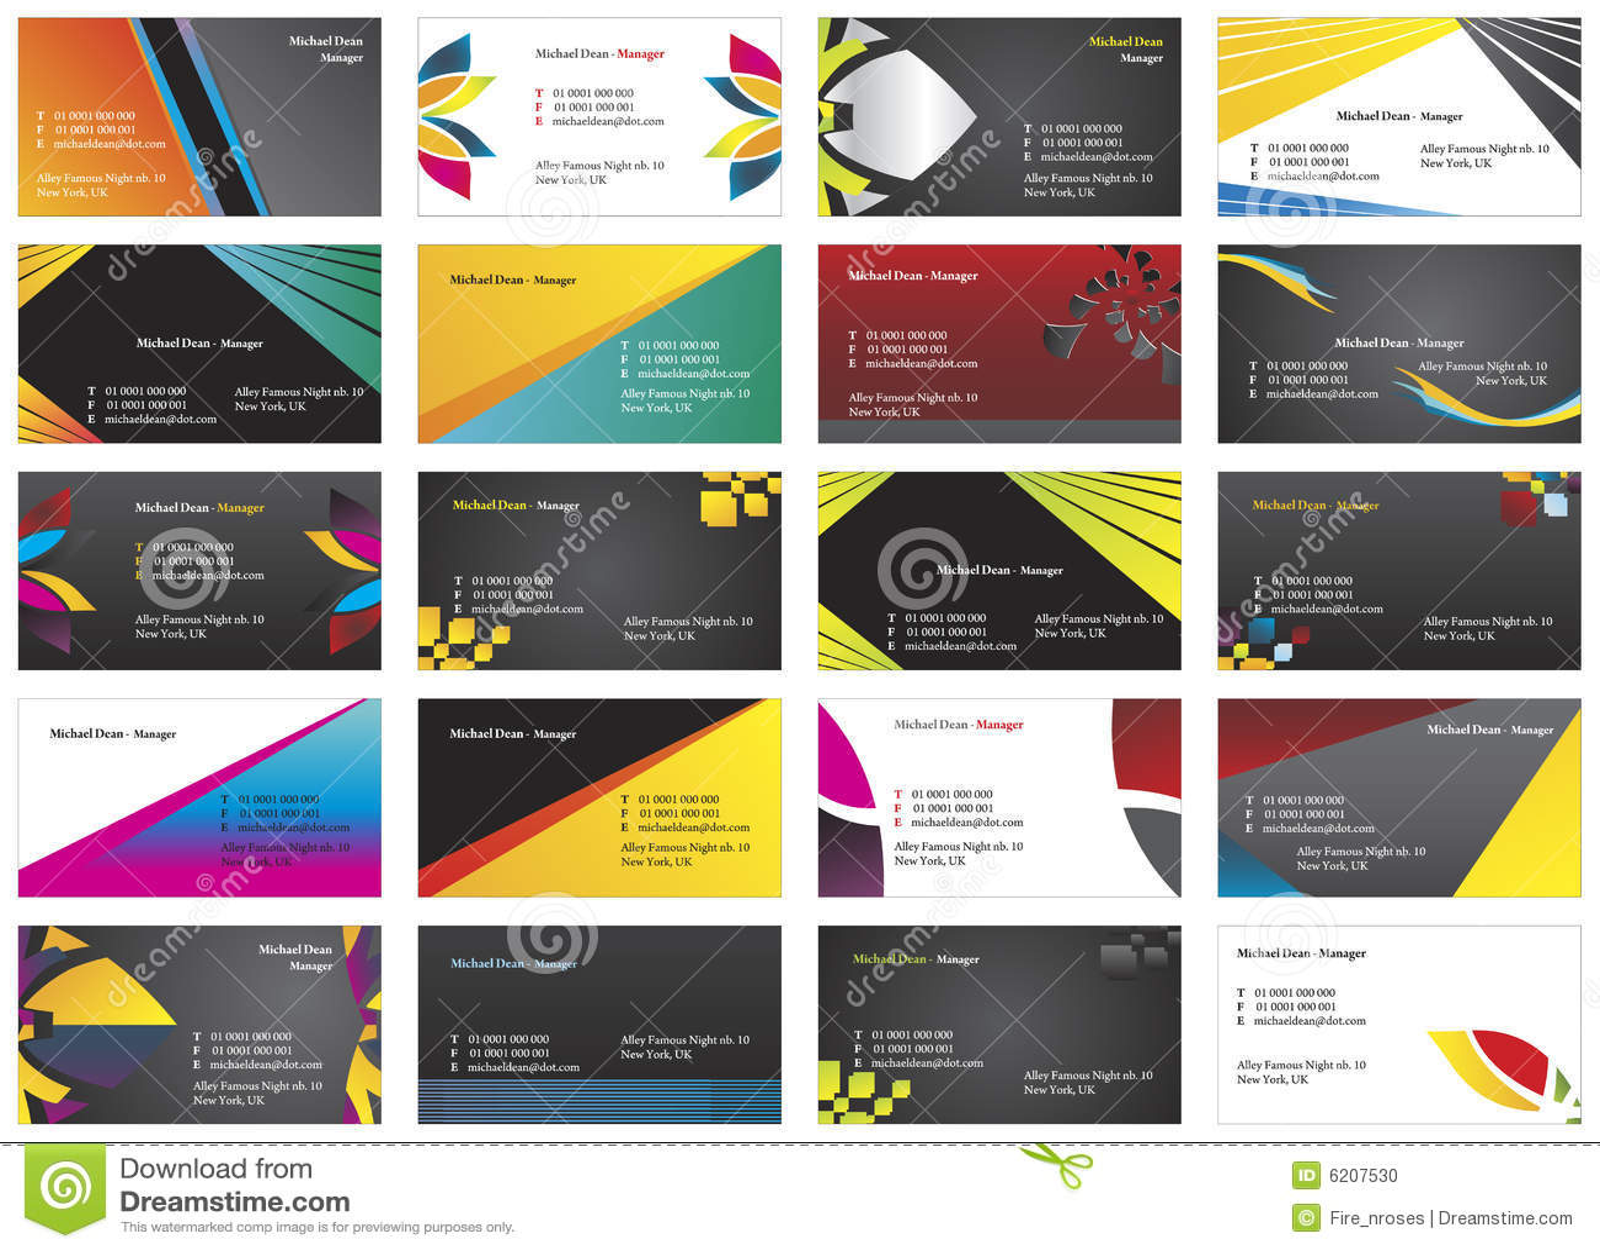 Visiting Cards 4 Stock Photos - Image: 6206963